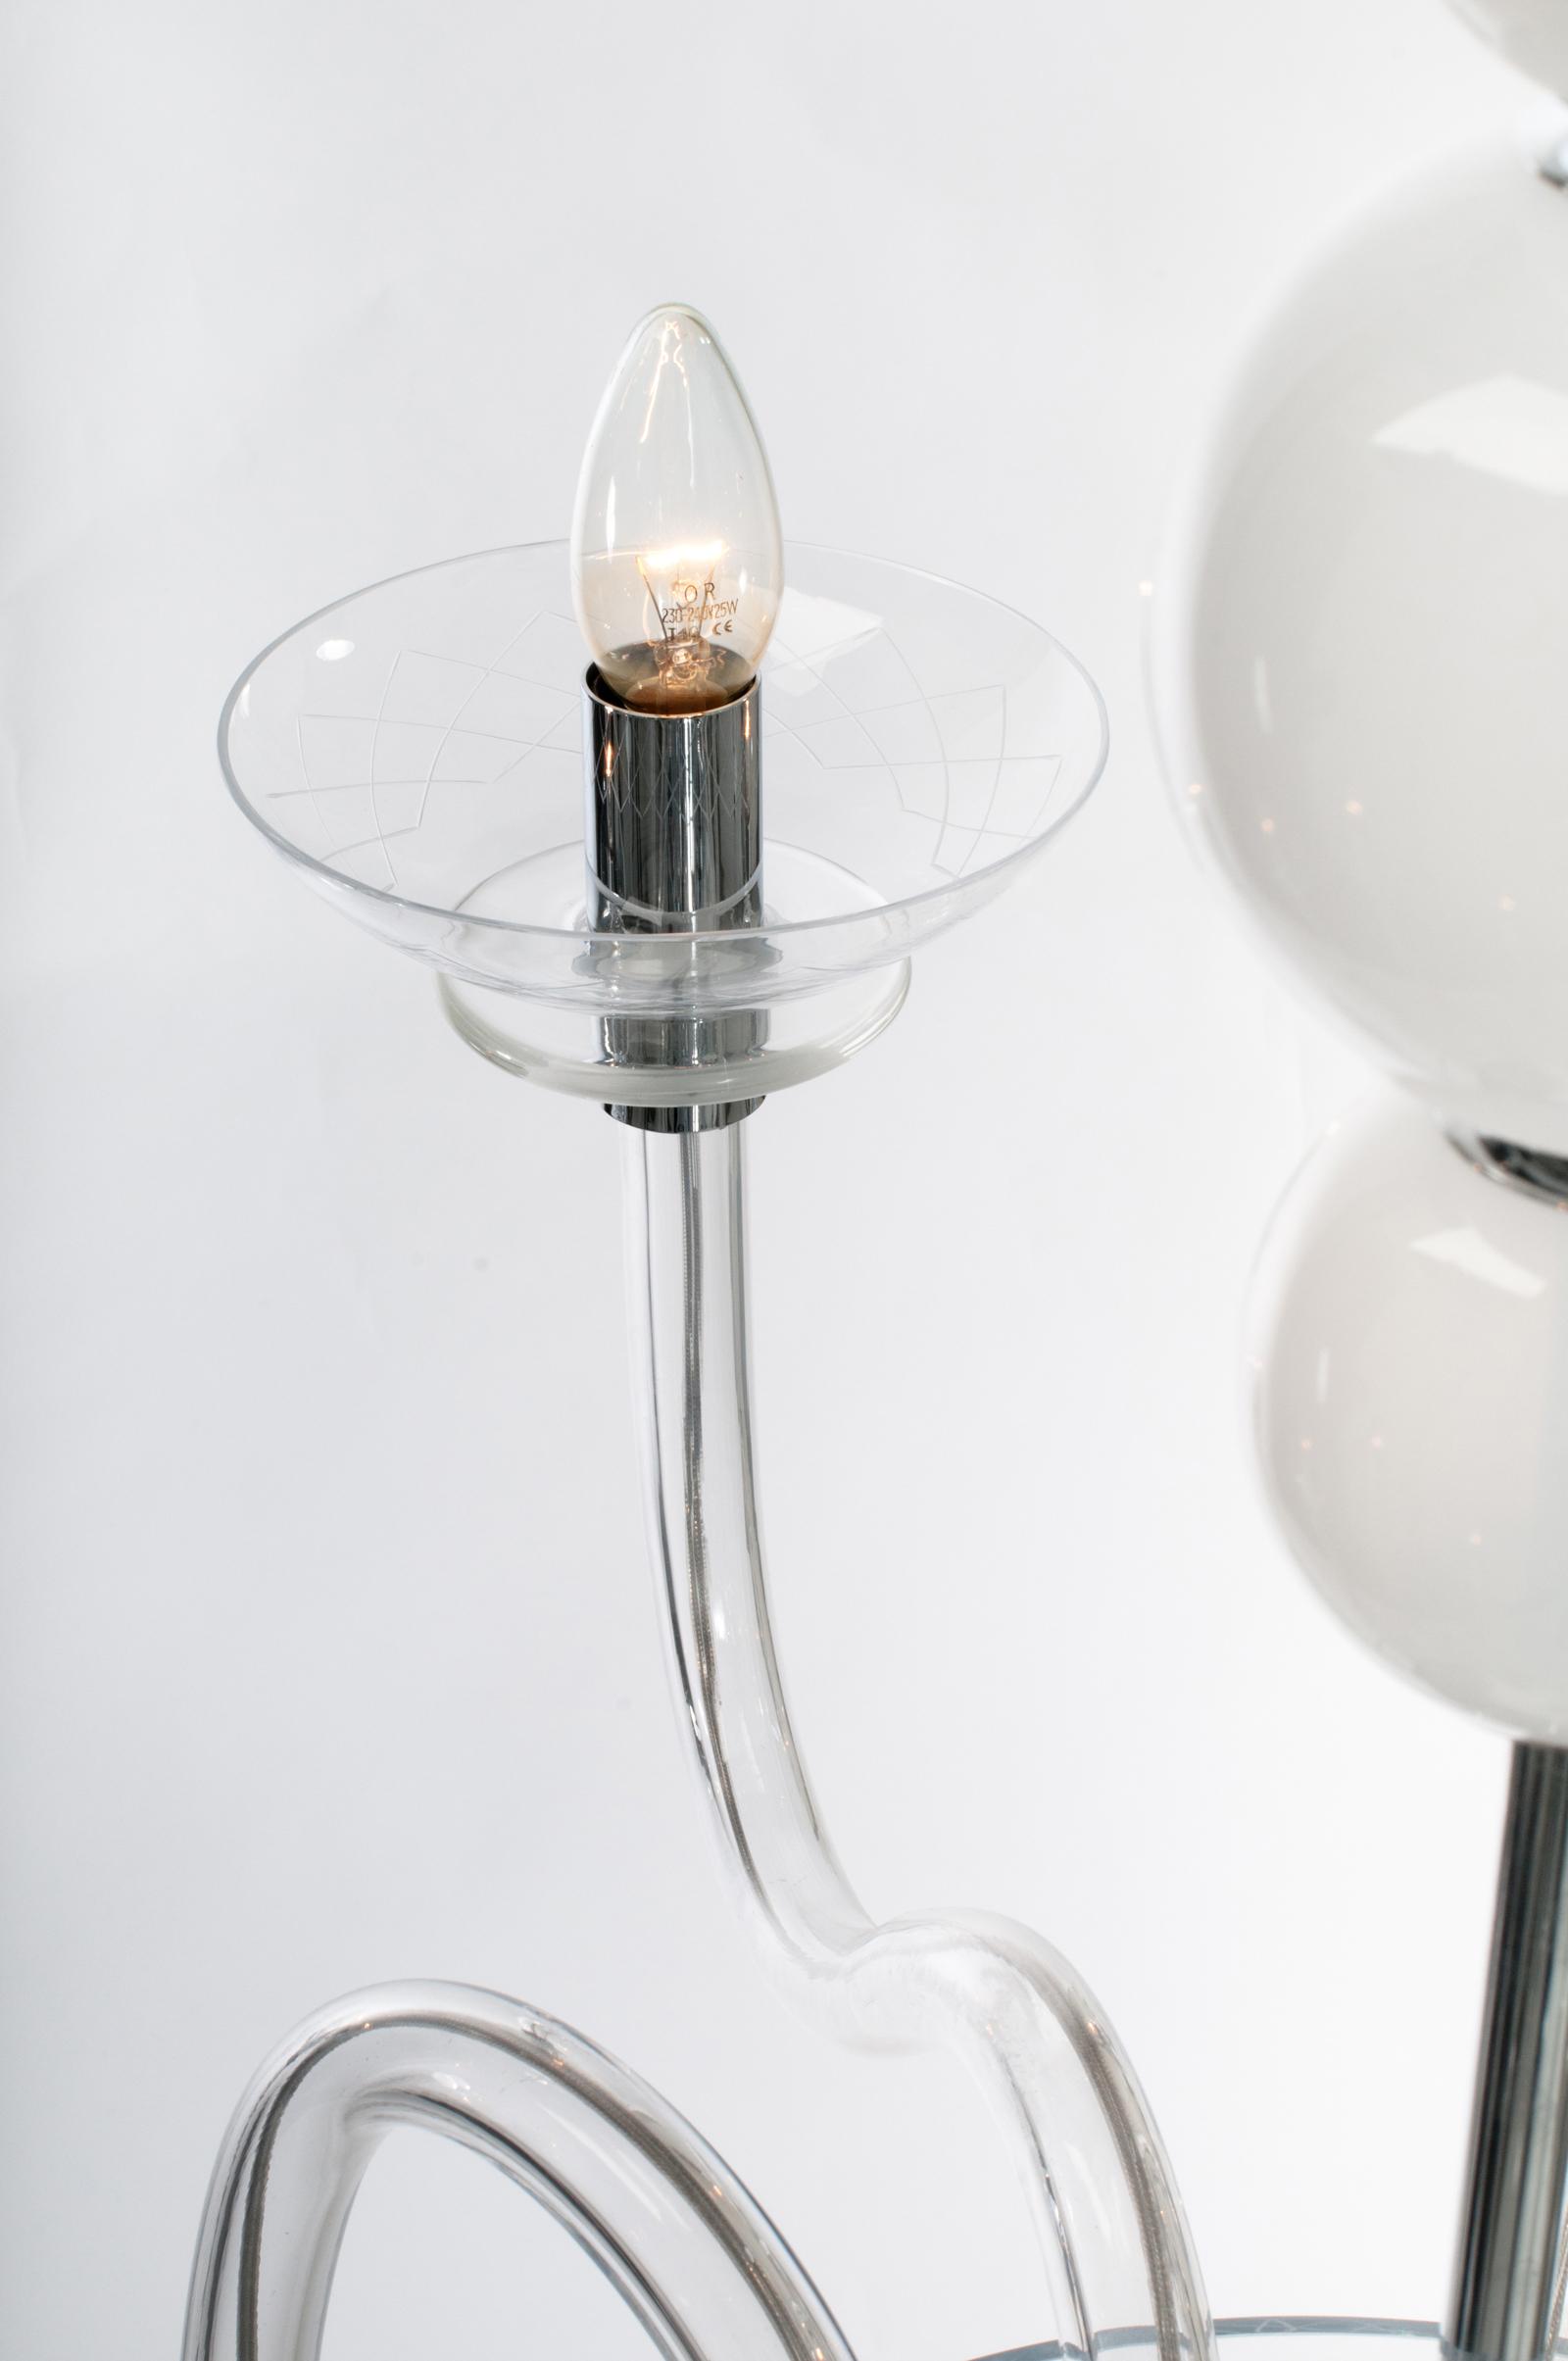 cic-lustre-chandelier-veronese-10.jpg